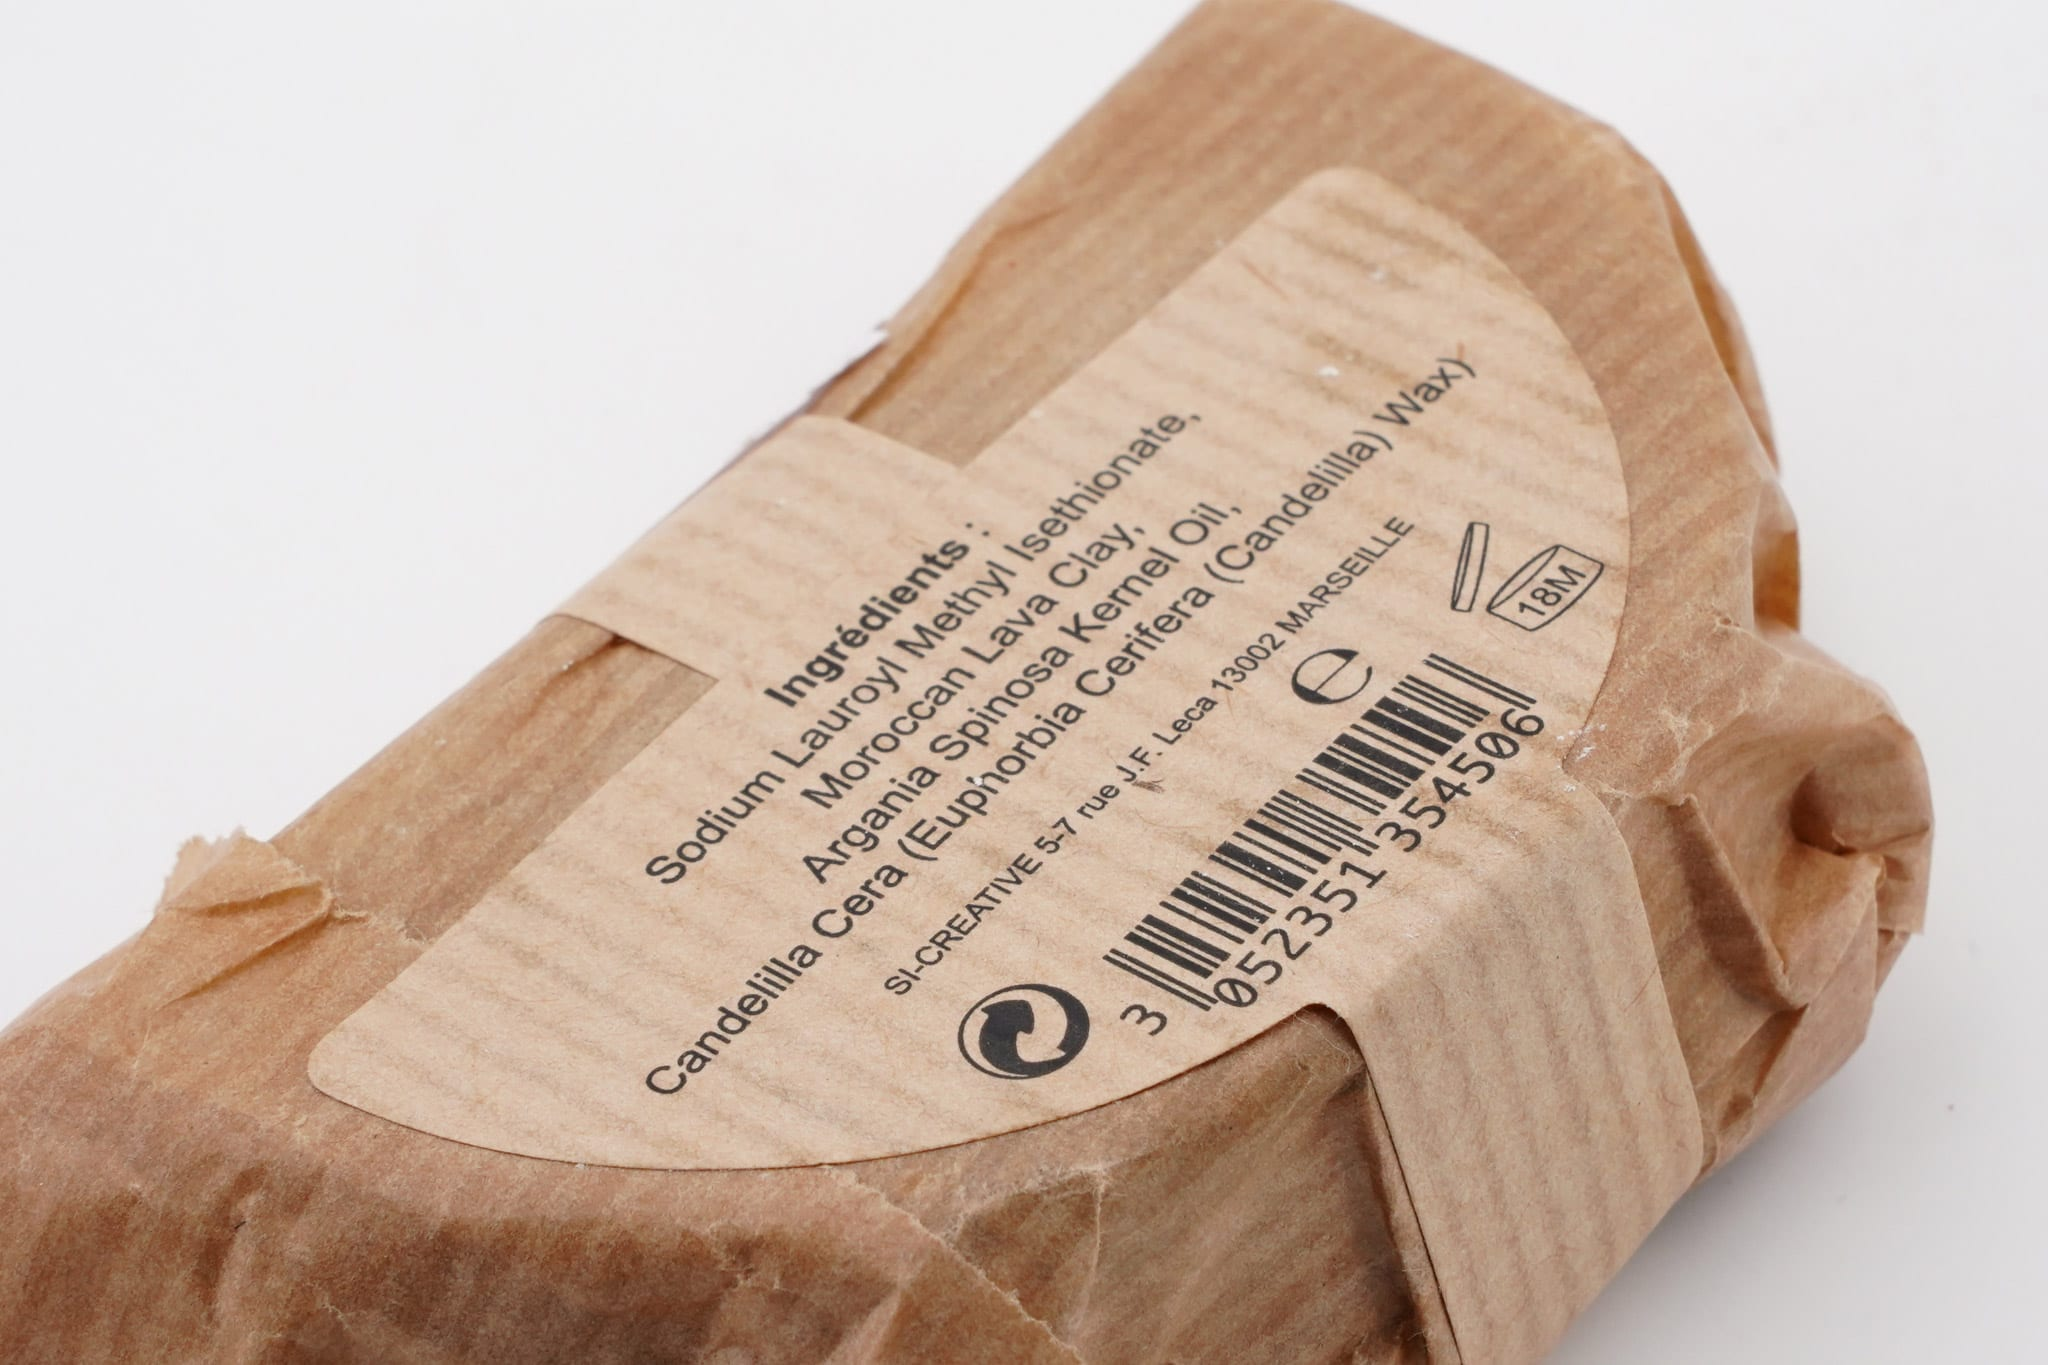 Shampoo solido 100% naturale – 70g